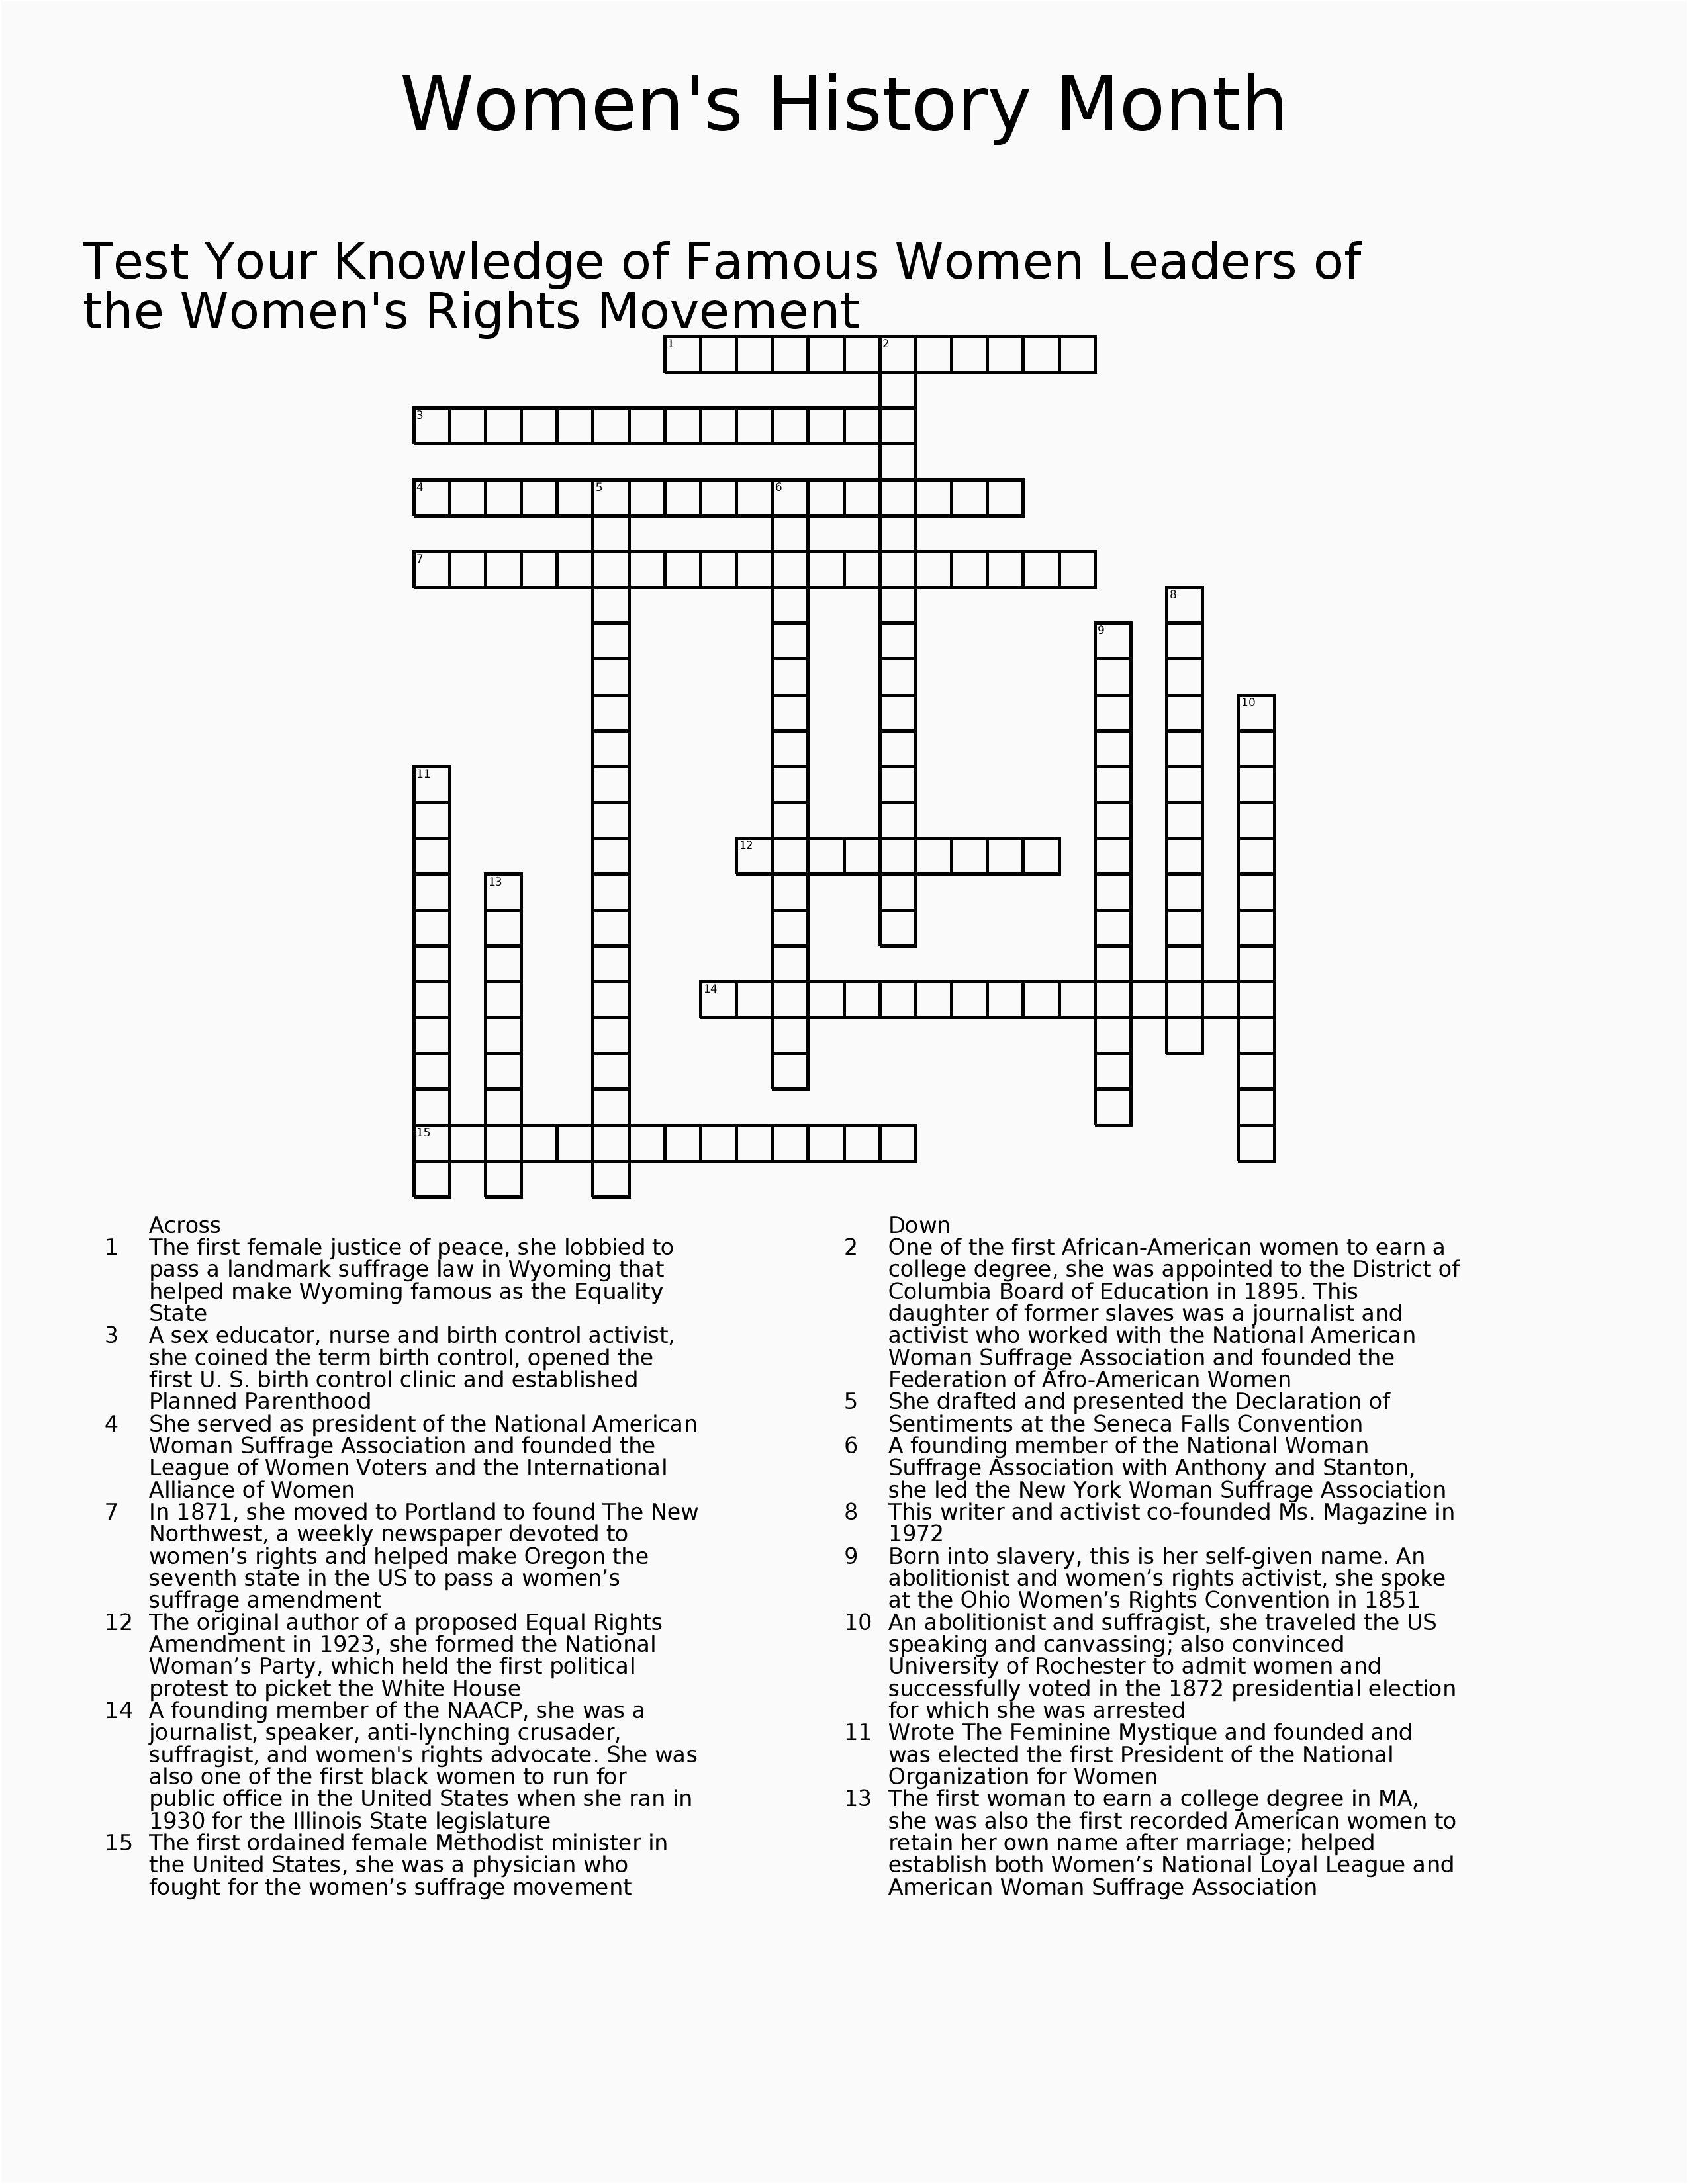 Black History Crossword Puzzle Printable – Open-Source-Design - History Crossword Puzzles Printable